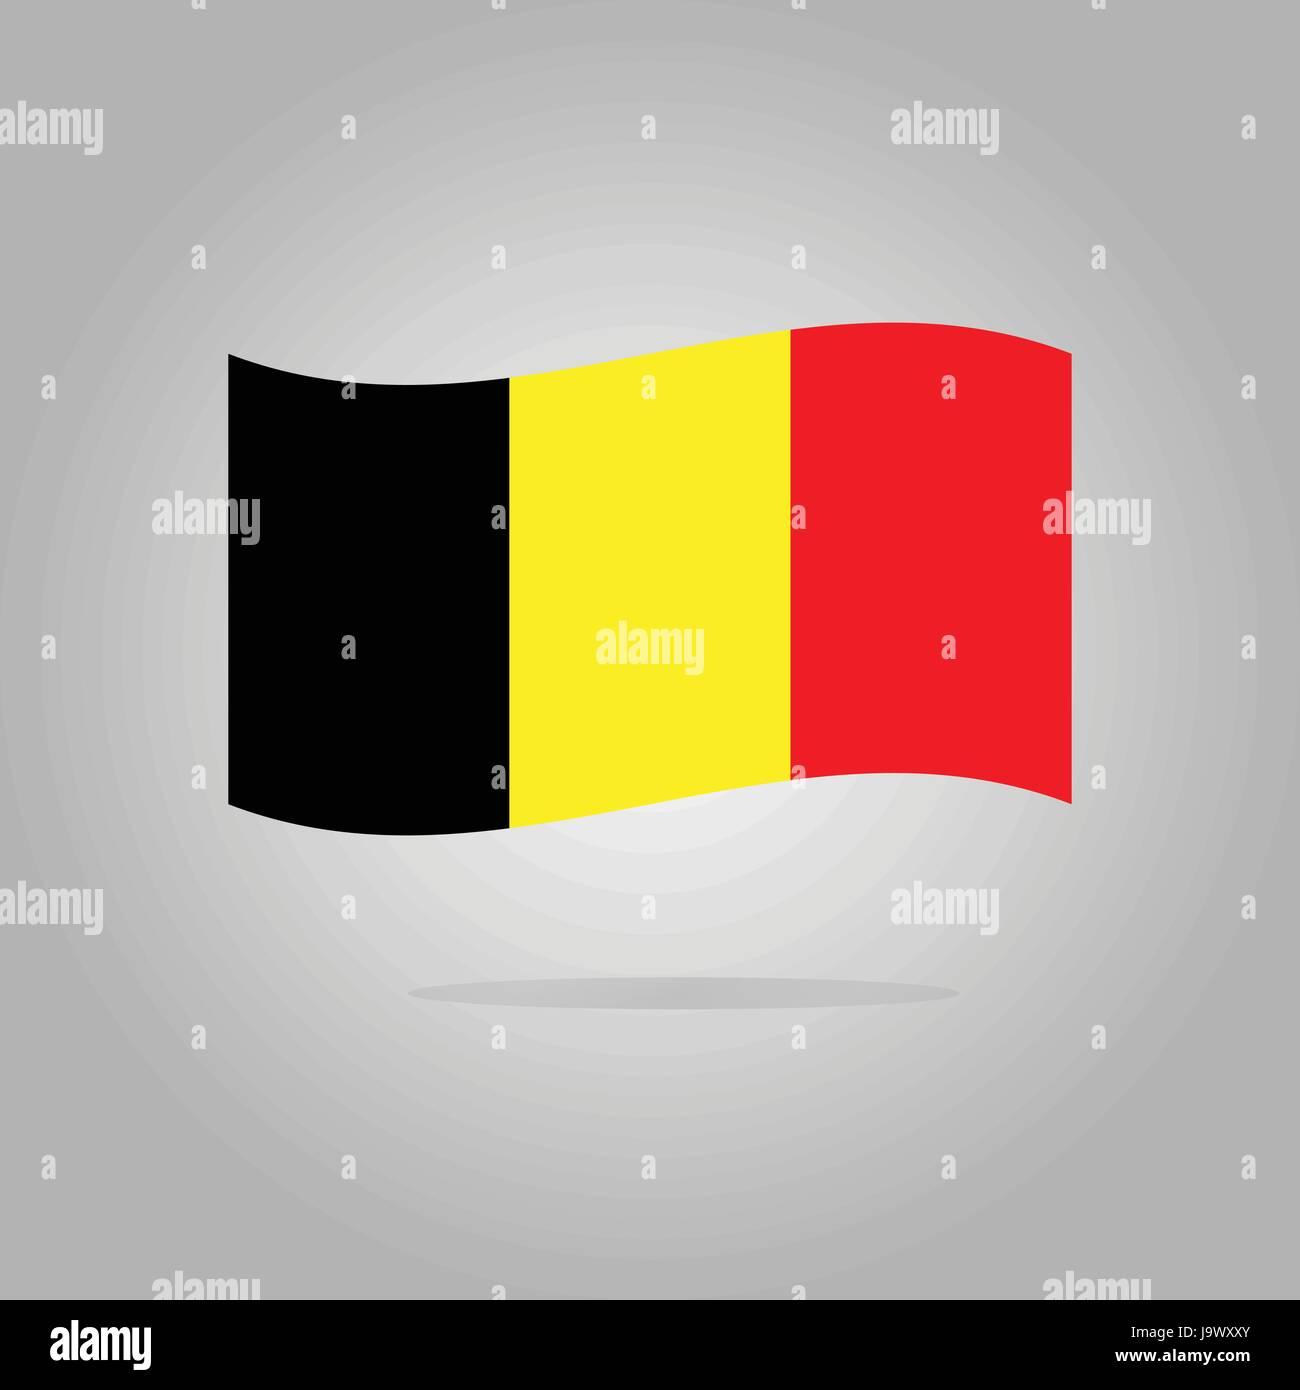 Belgium flag design illustration - Stock Vector